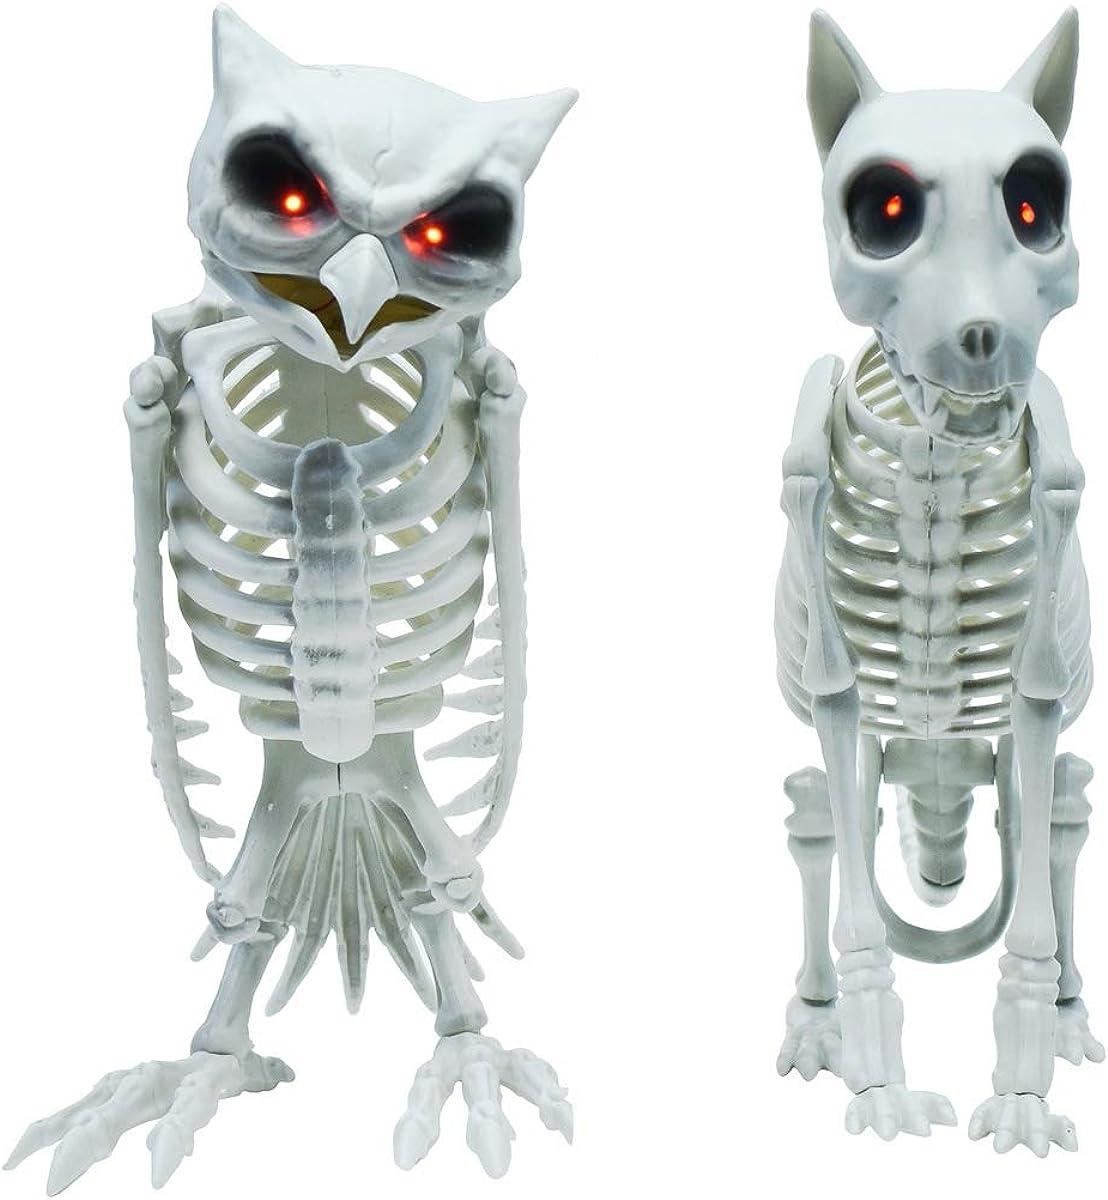 Treasure Gurus 2pc Scary Light Up Skeleton Dog Owl Indoor Haunted House Prop Spooky Halloween Party Decor Set White